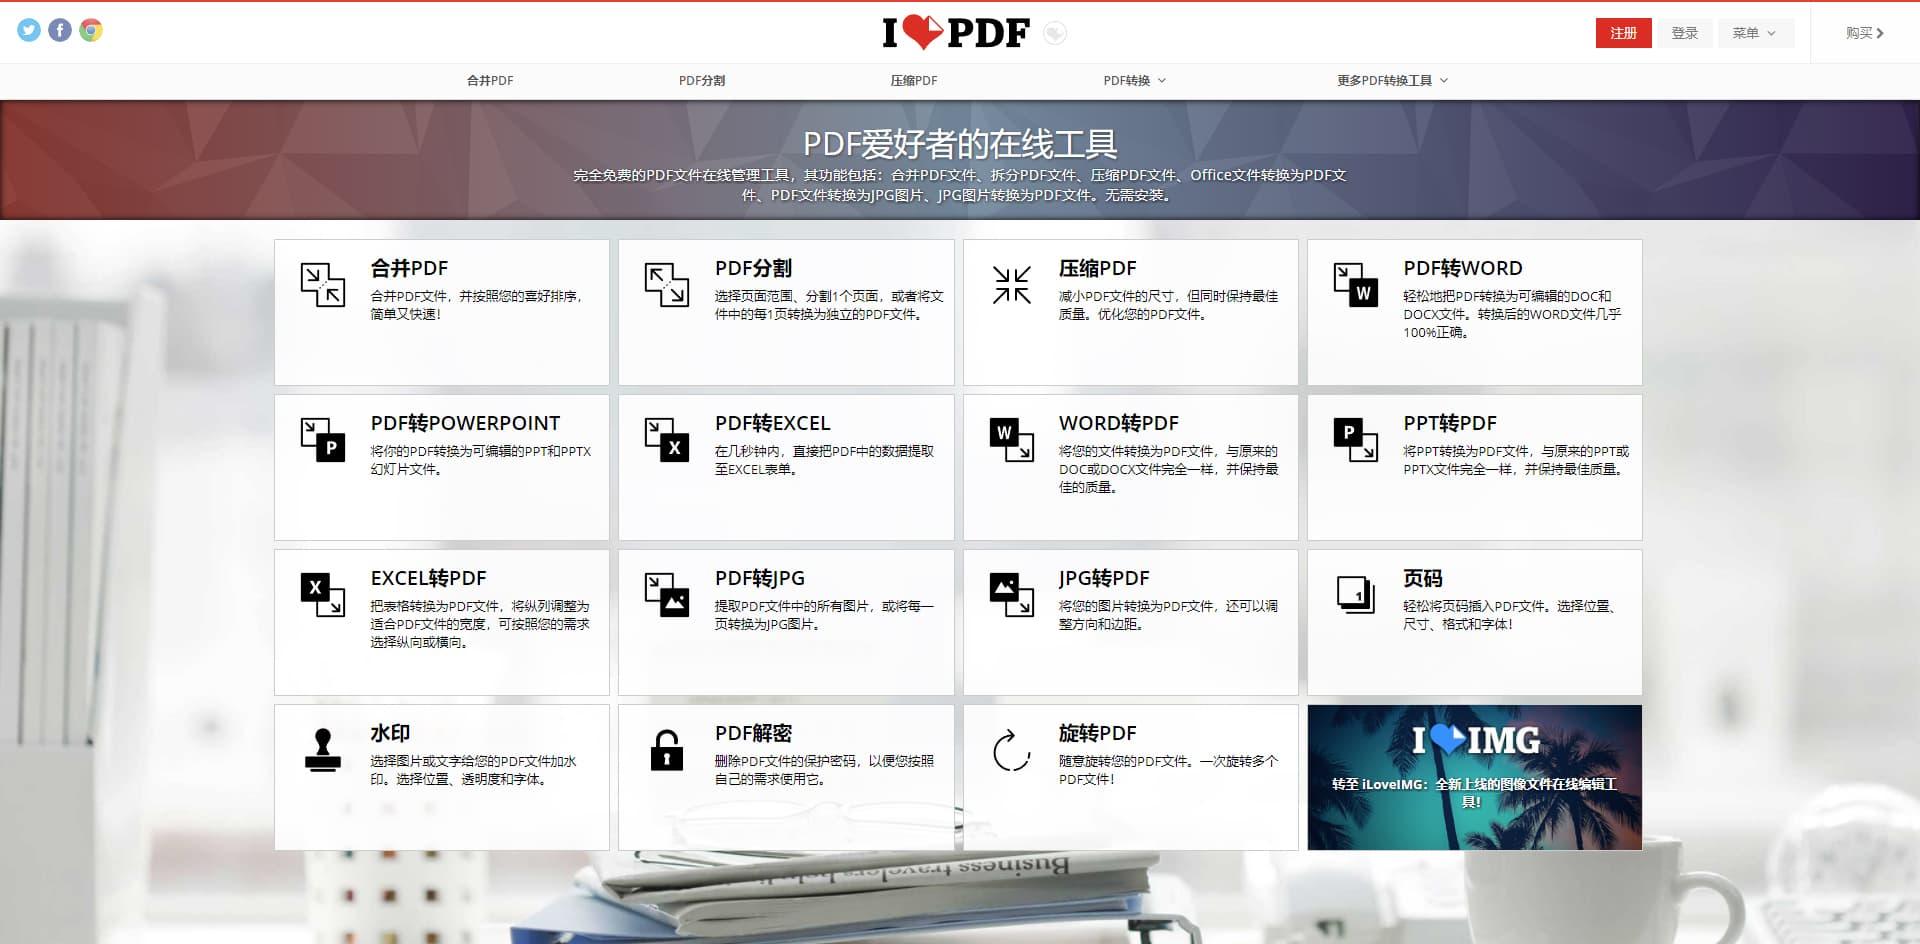 PDF在线编辑转档工具 – ilovePDF/EasyPDF